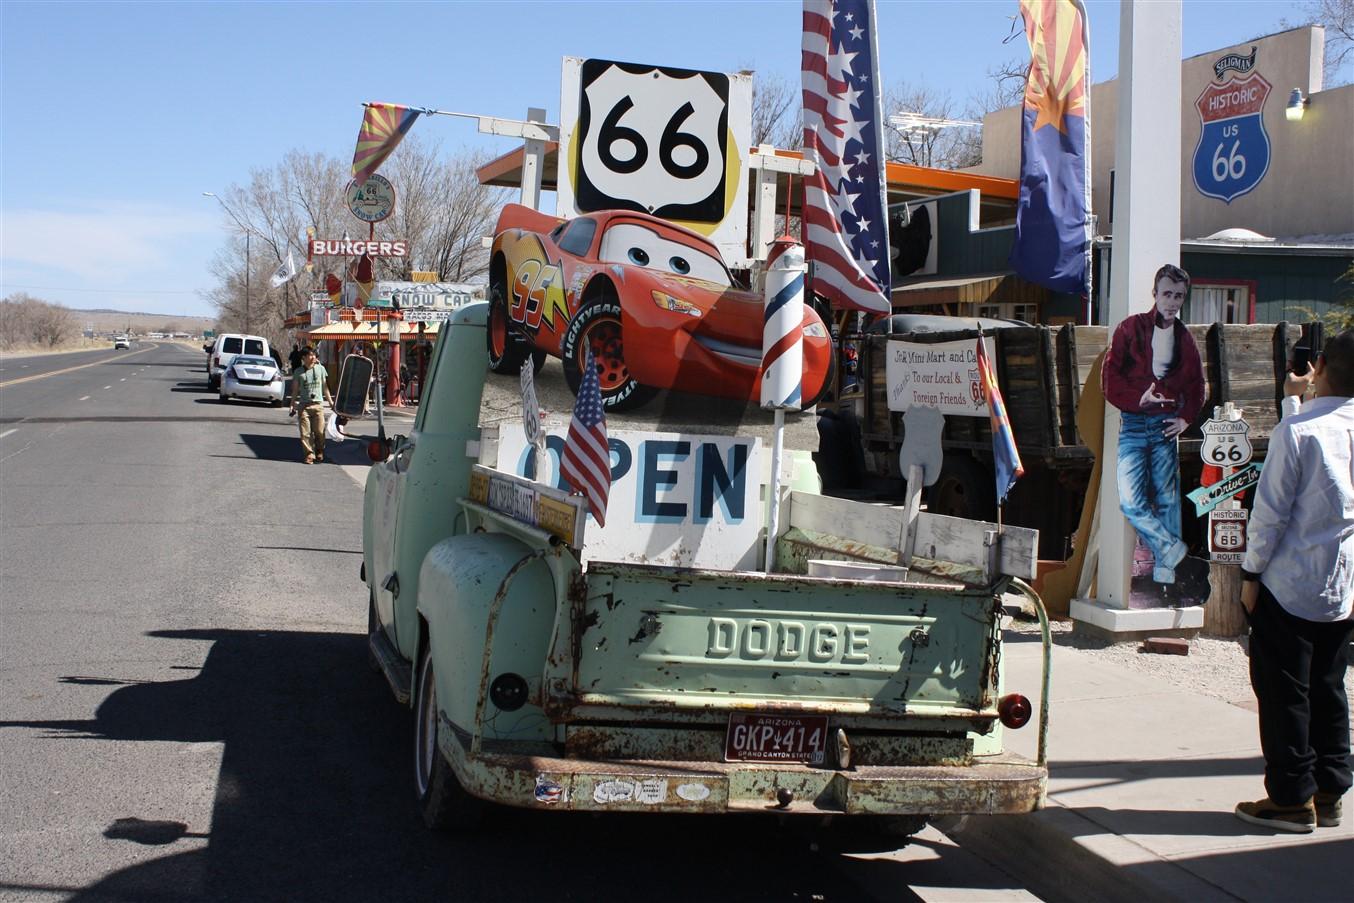 2012 03 14 Route 66 Road Trip 200 Seligman Arizona.jpg